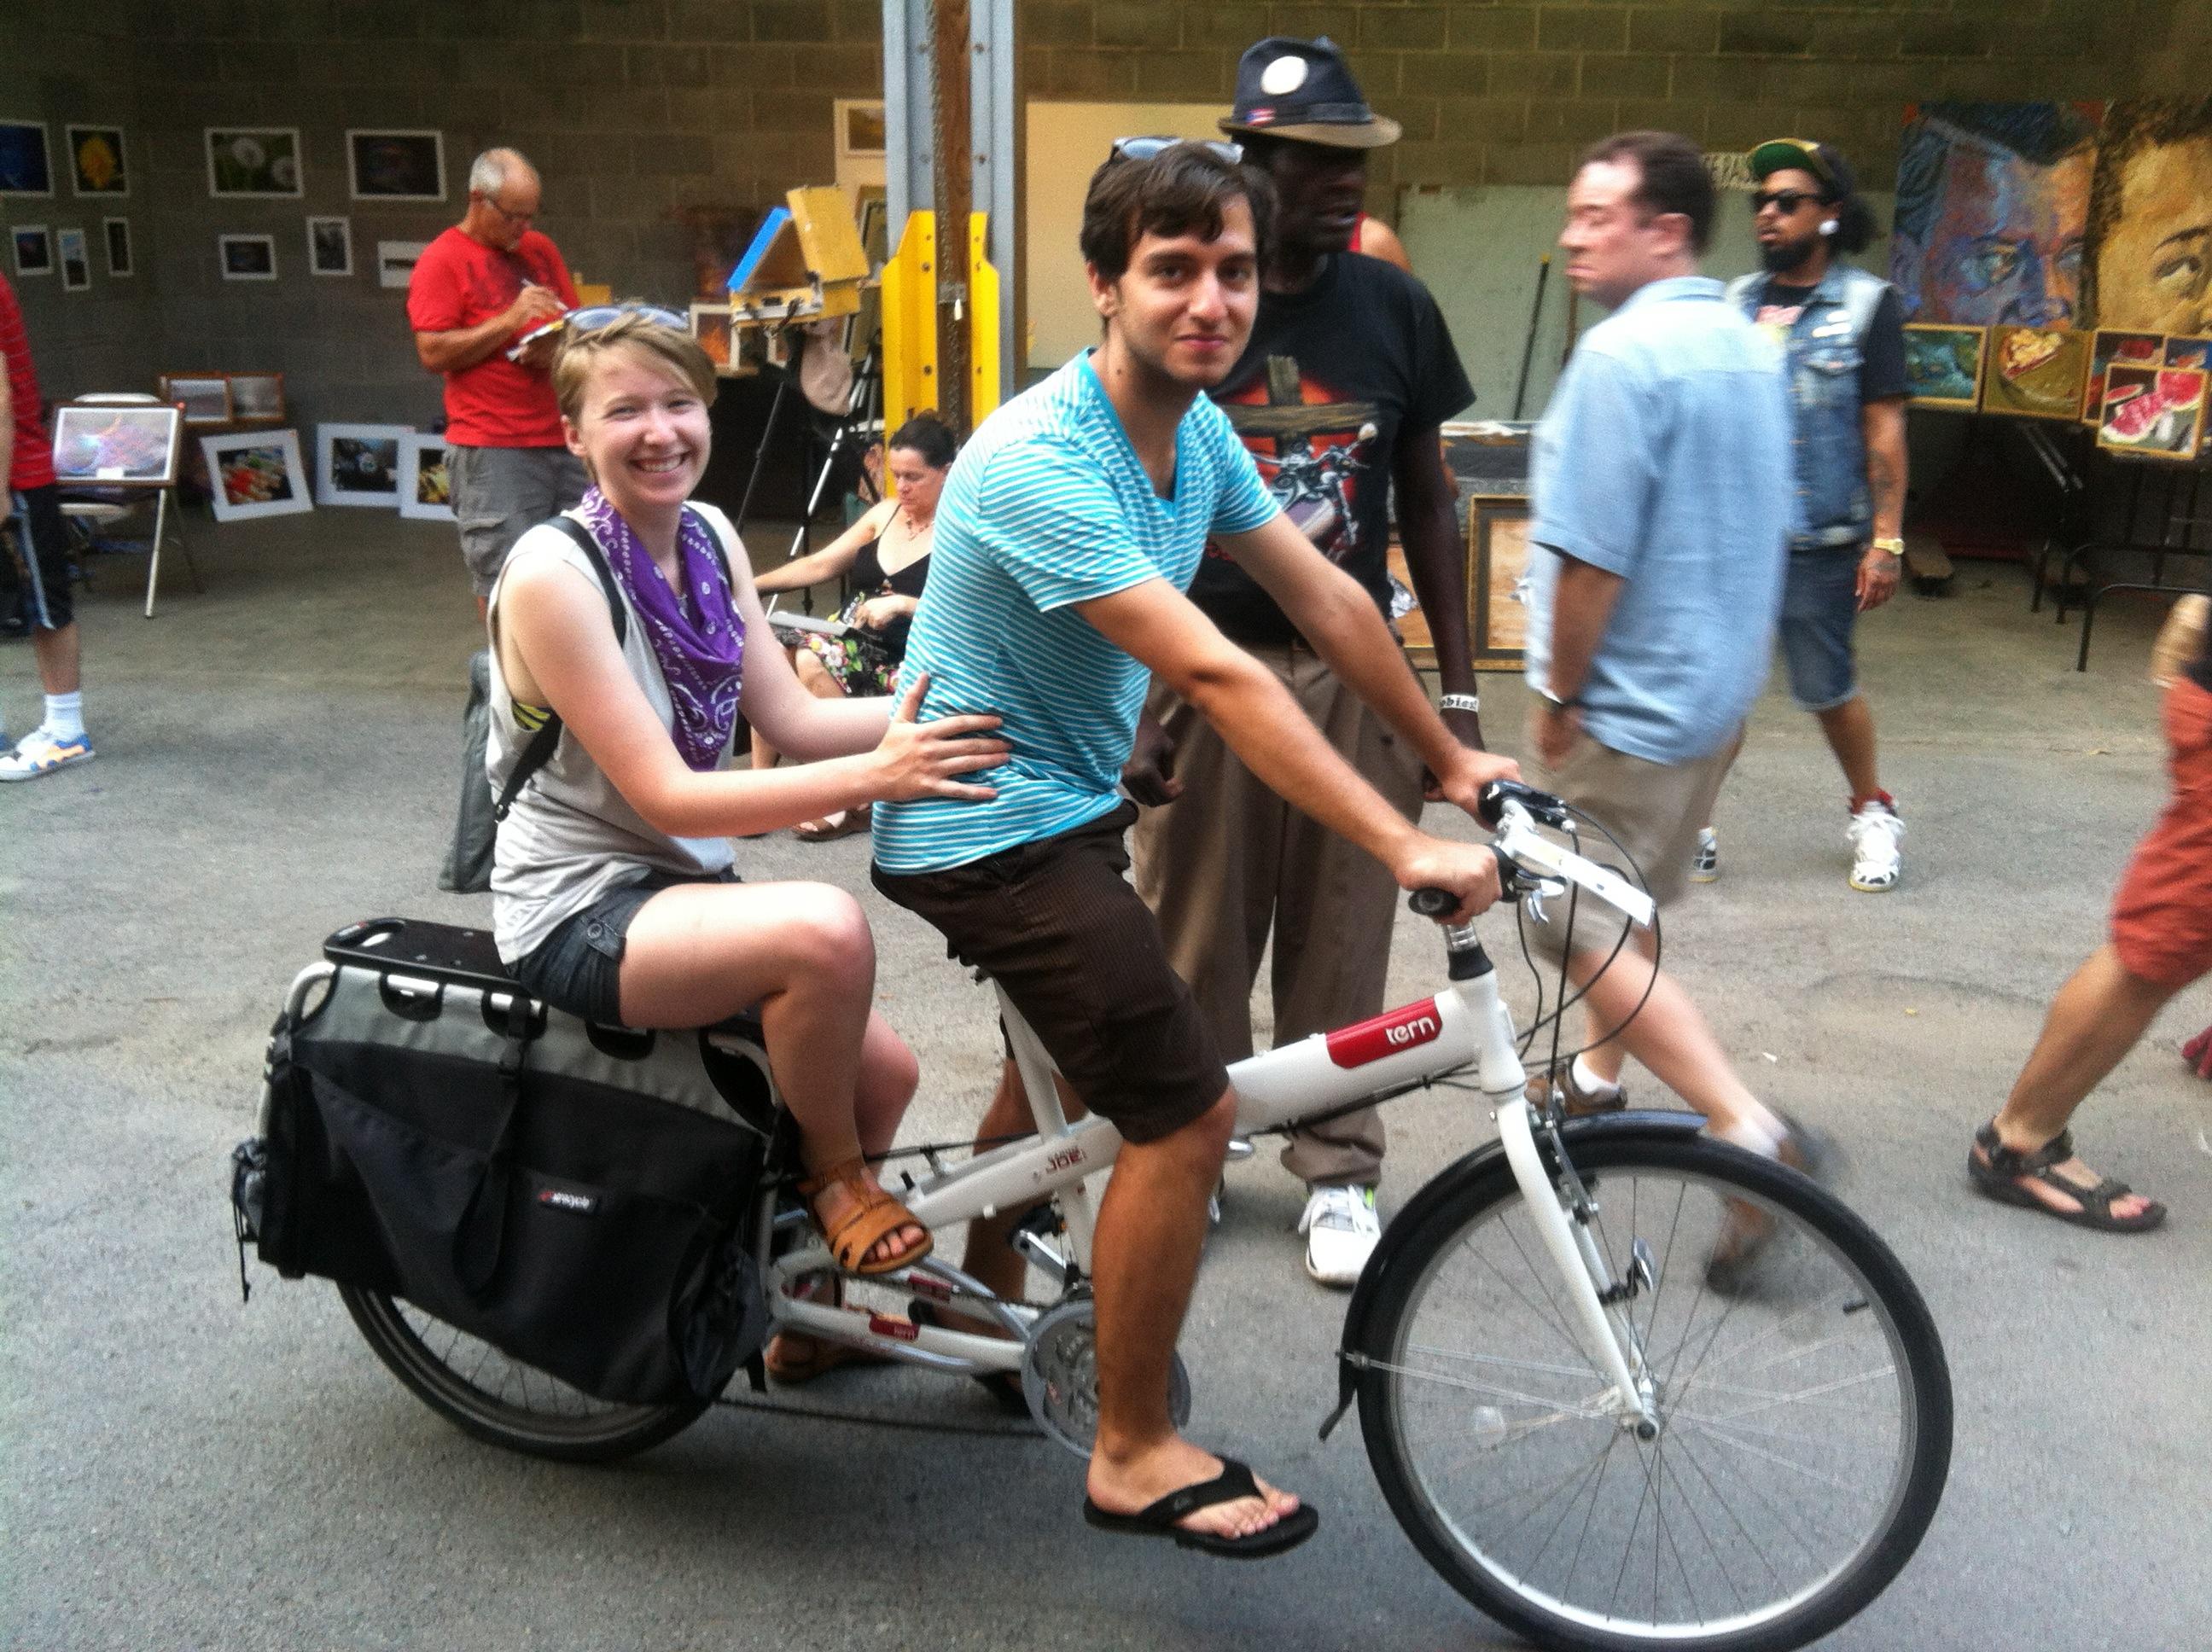 Bike Passenger Bikes As Transportation